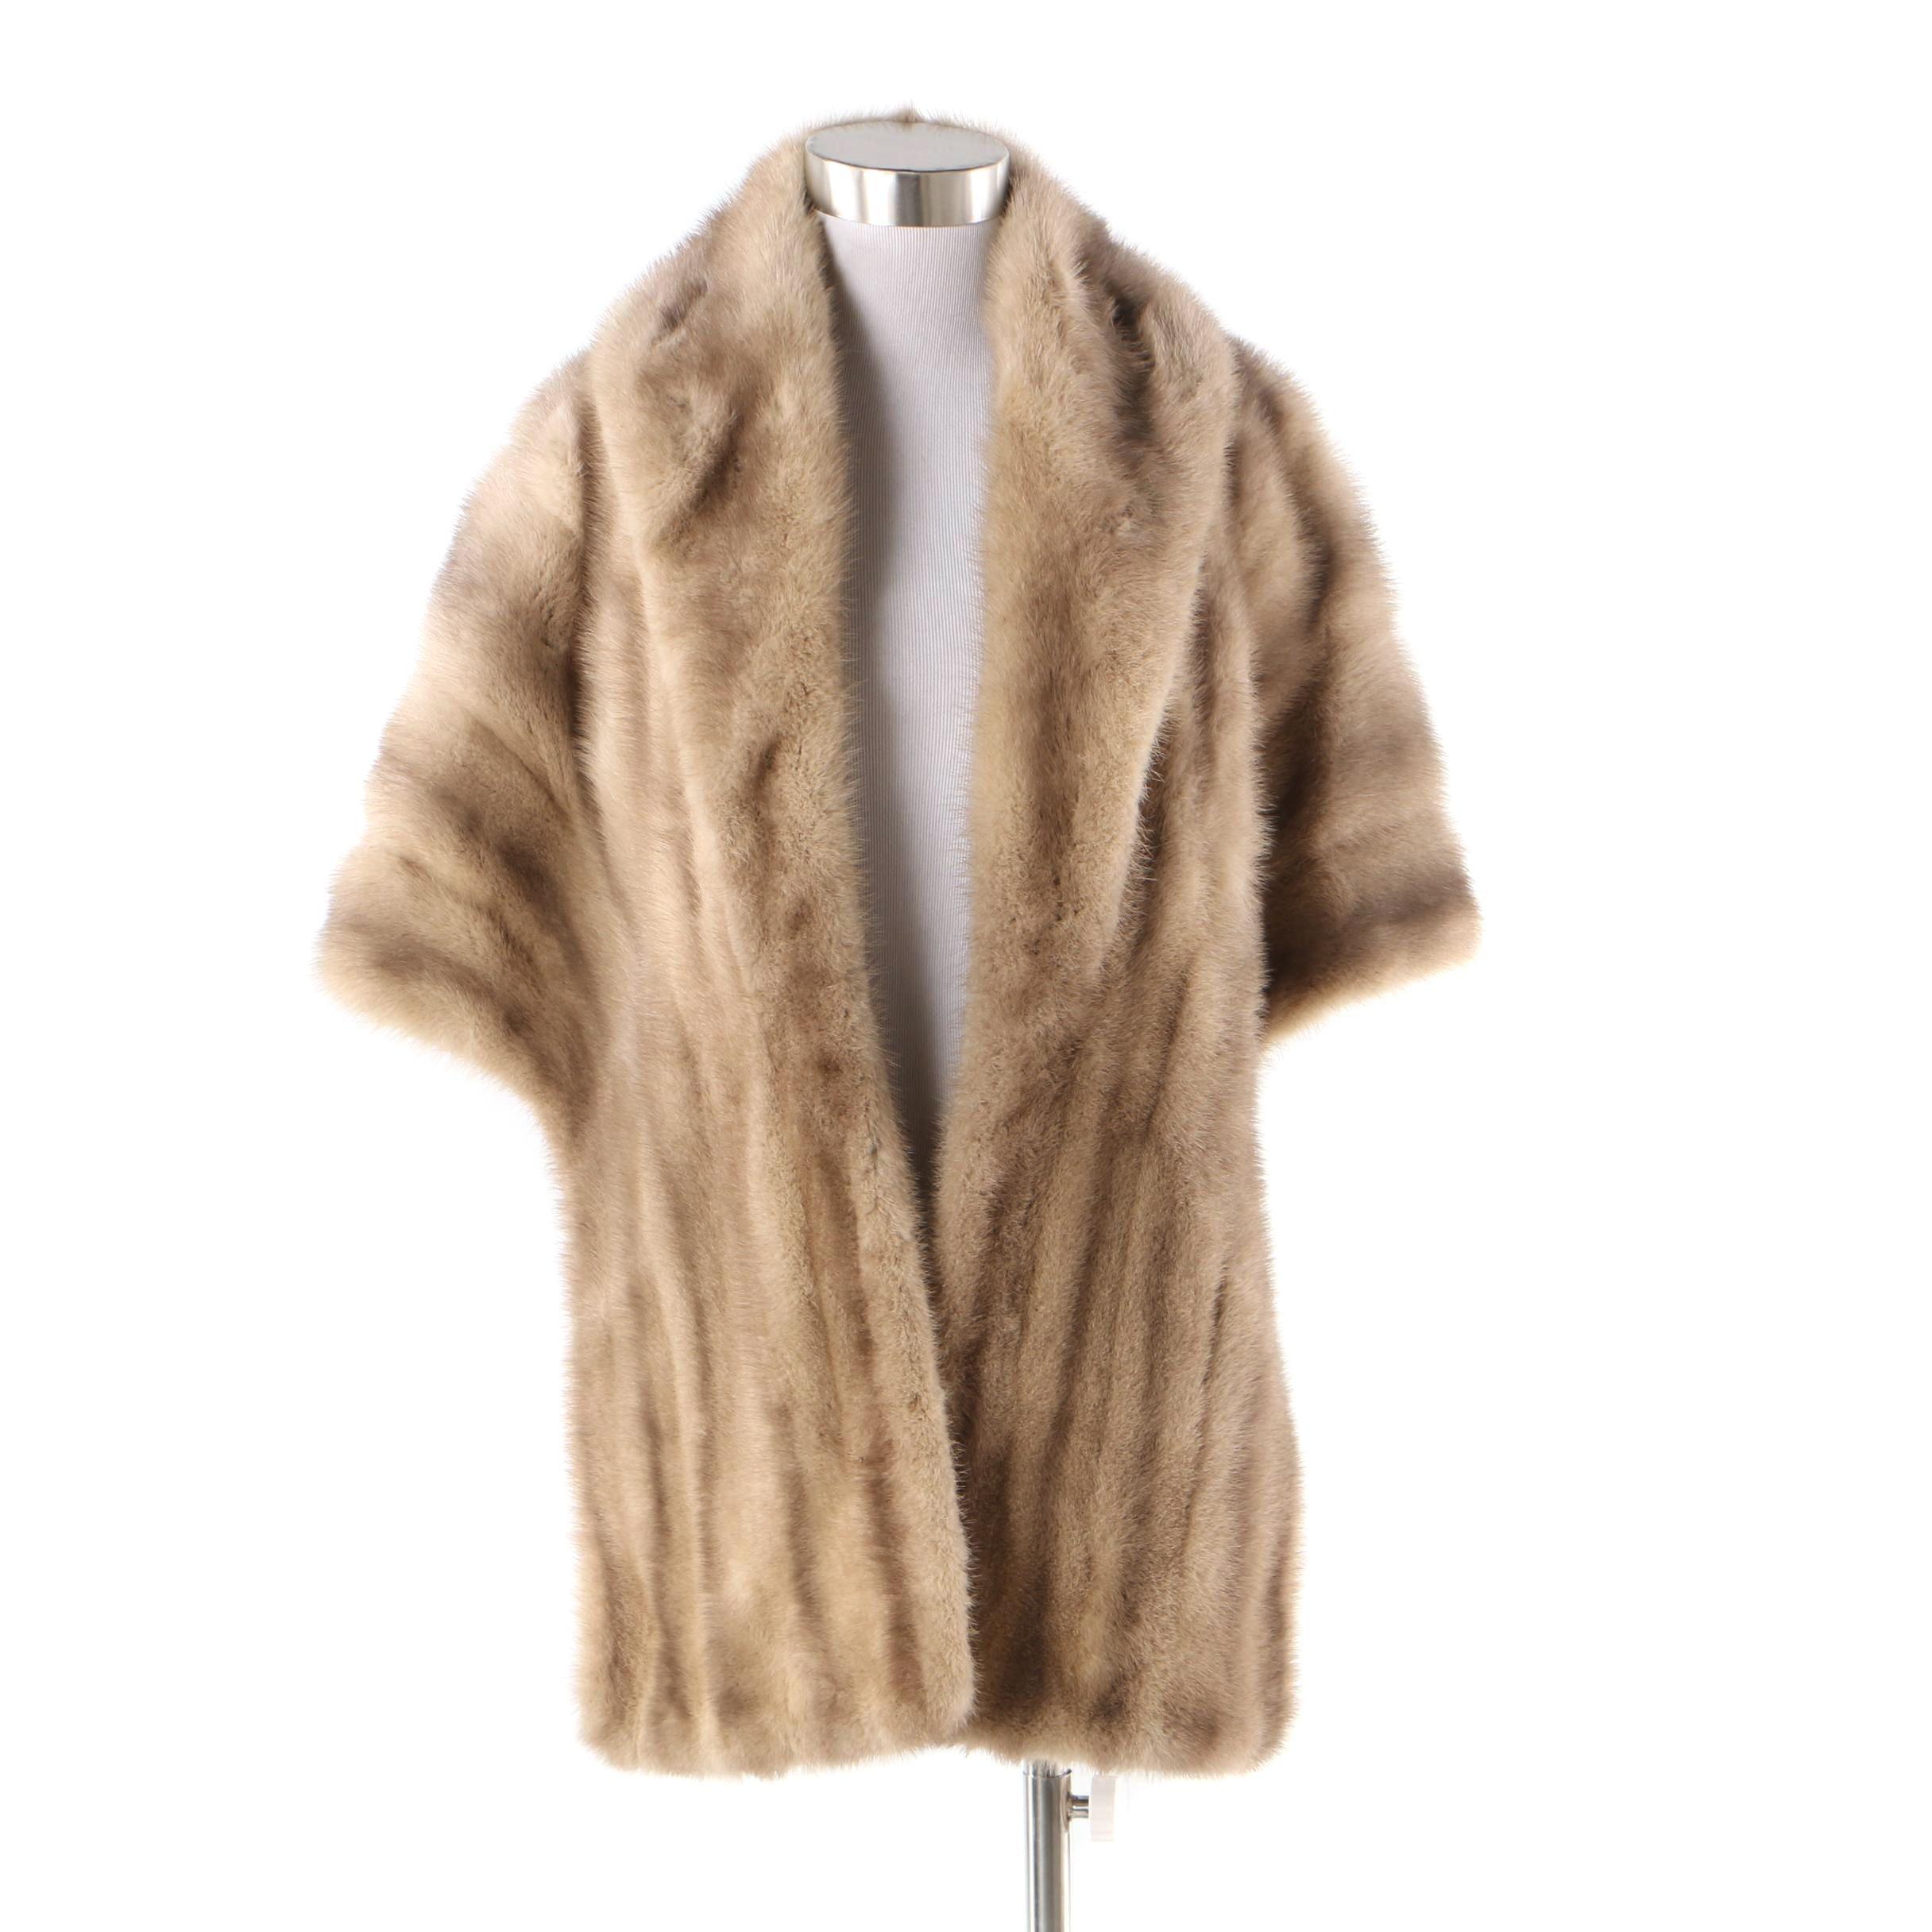 Women's Vintage Argenta Emba Ranched Mink Fur Stole